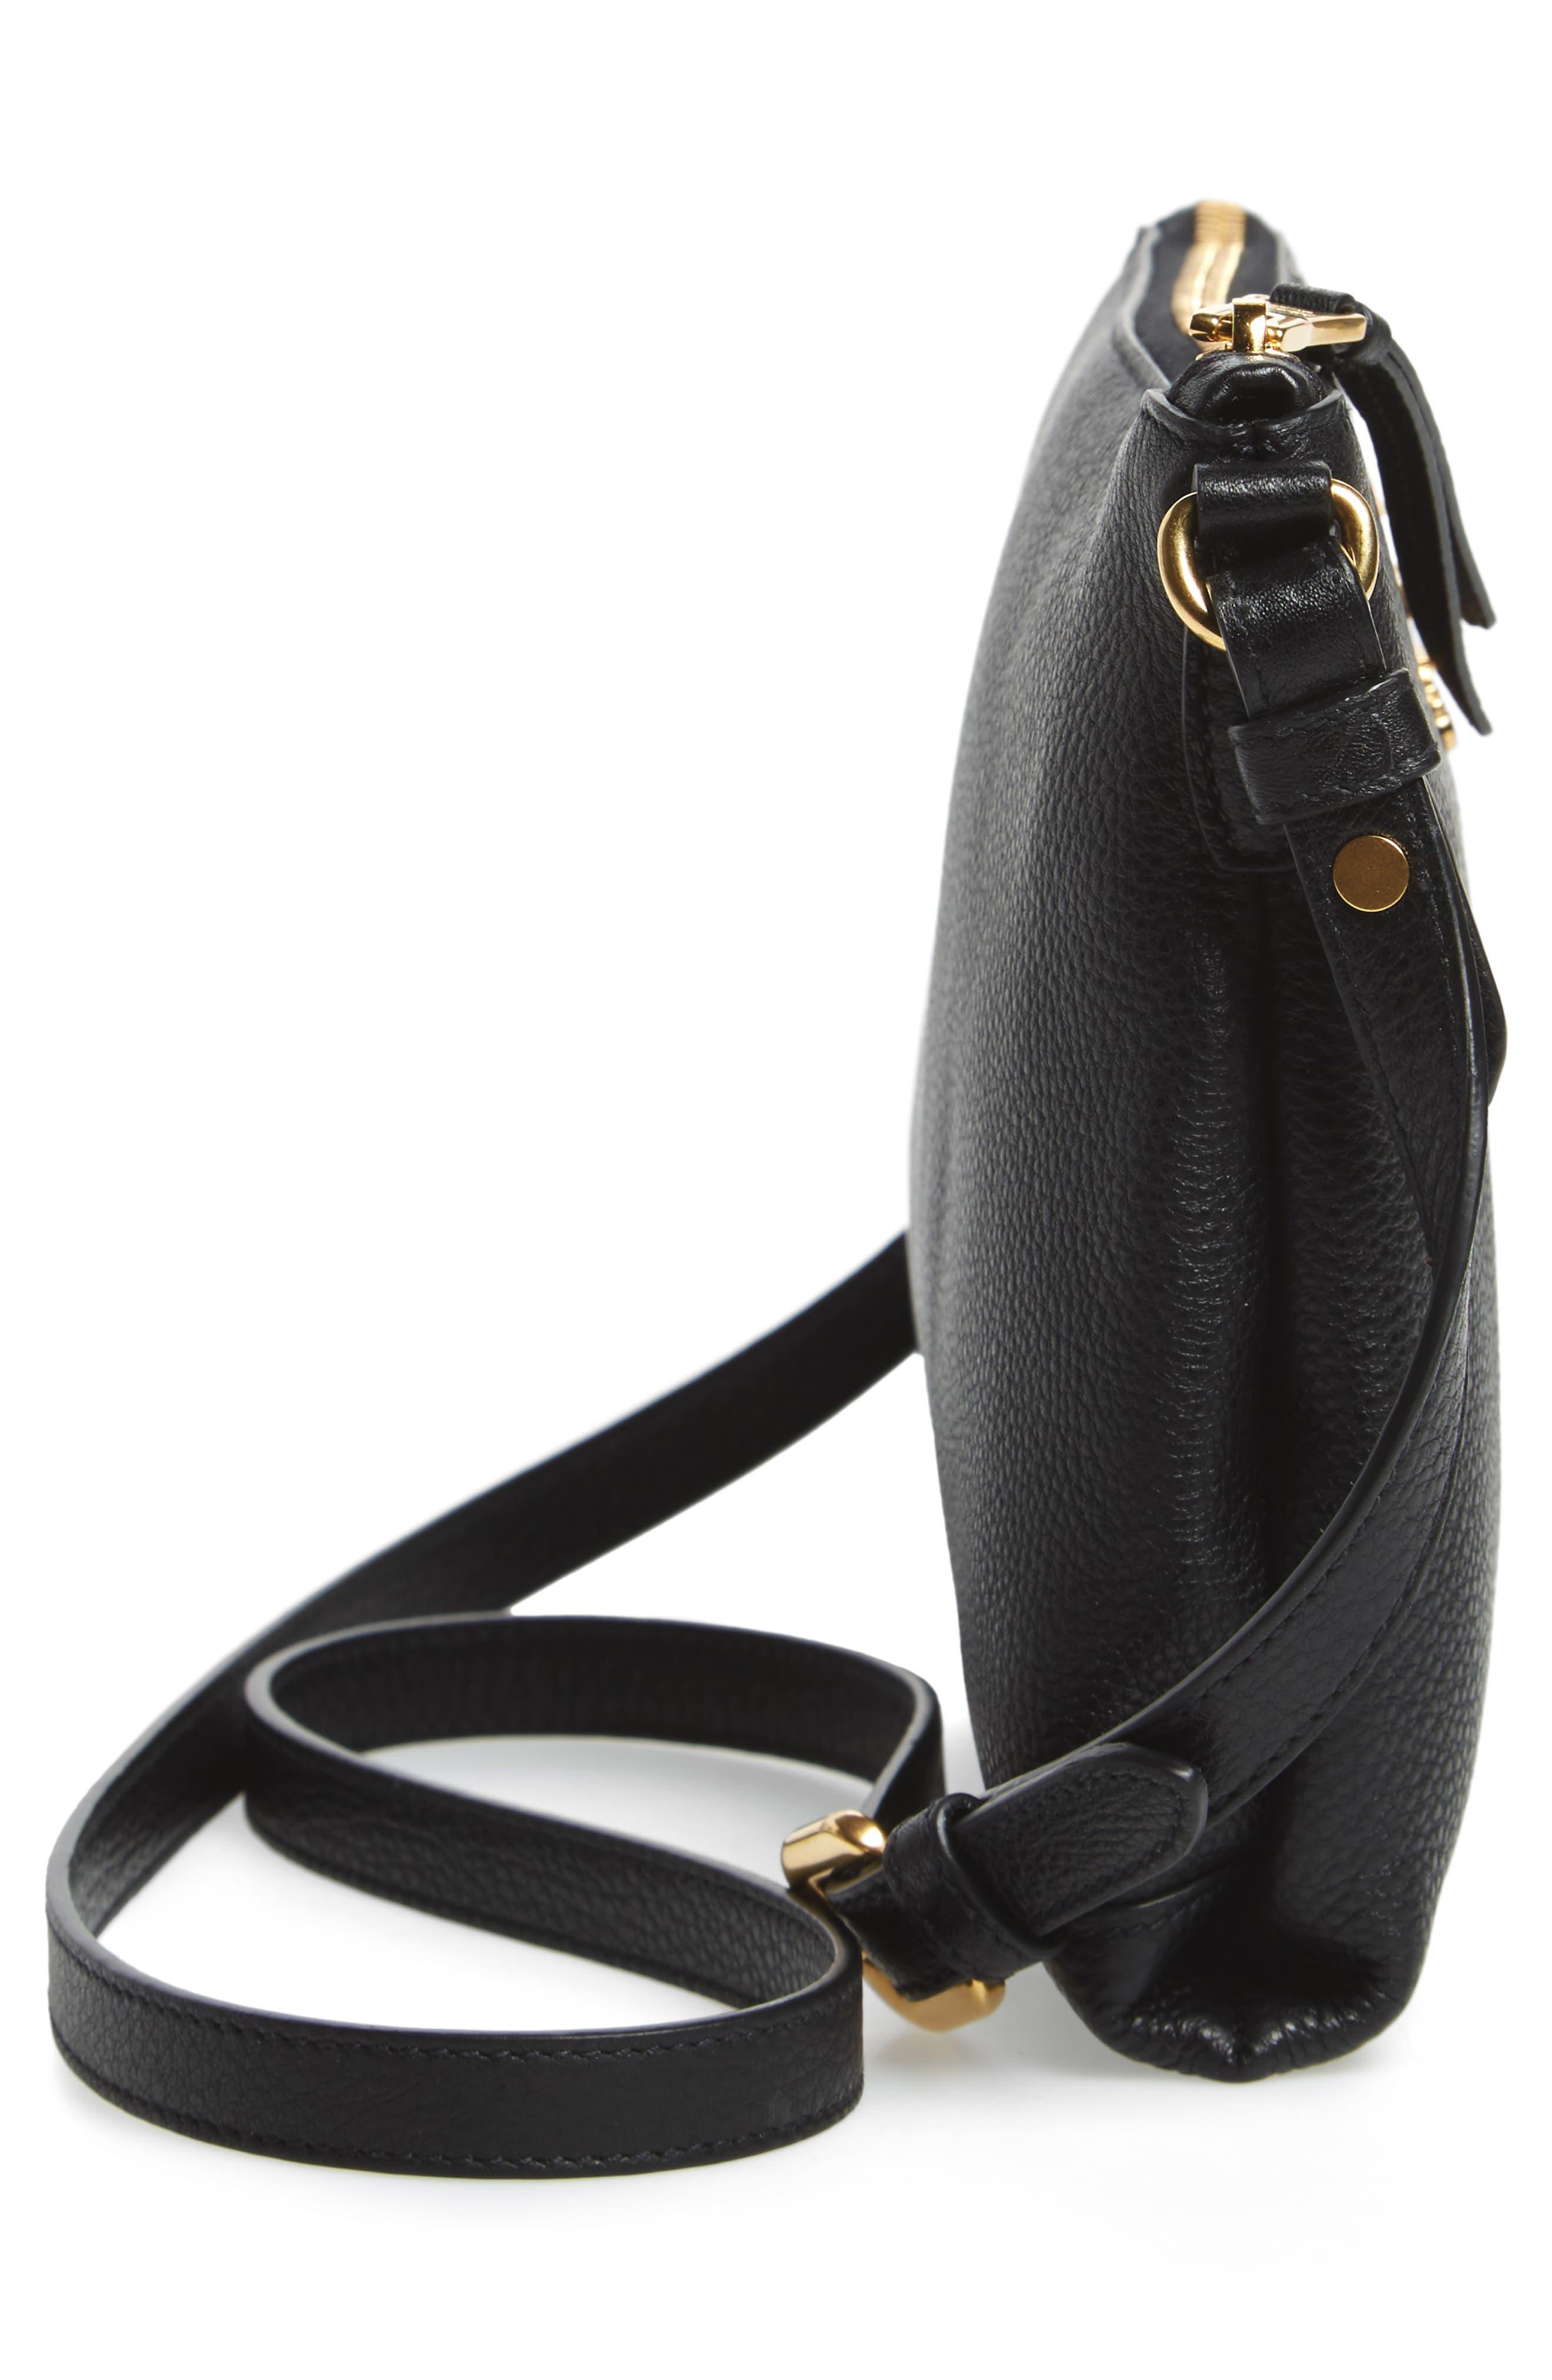 Vitello Daino Leather Crossbody Bag,                             Alternate thumbnail 6, color,                             001